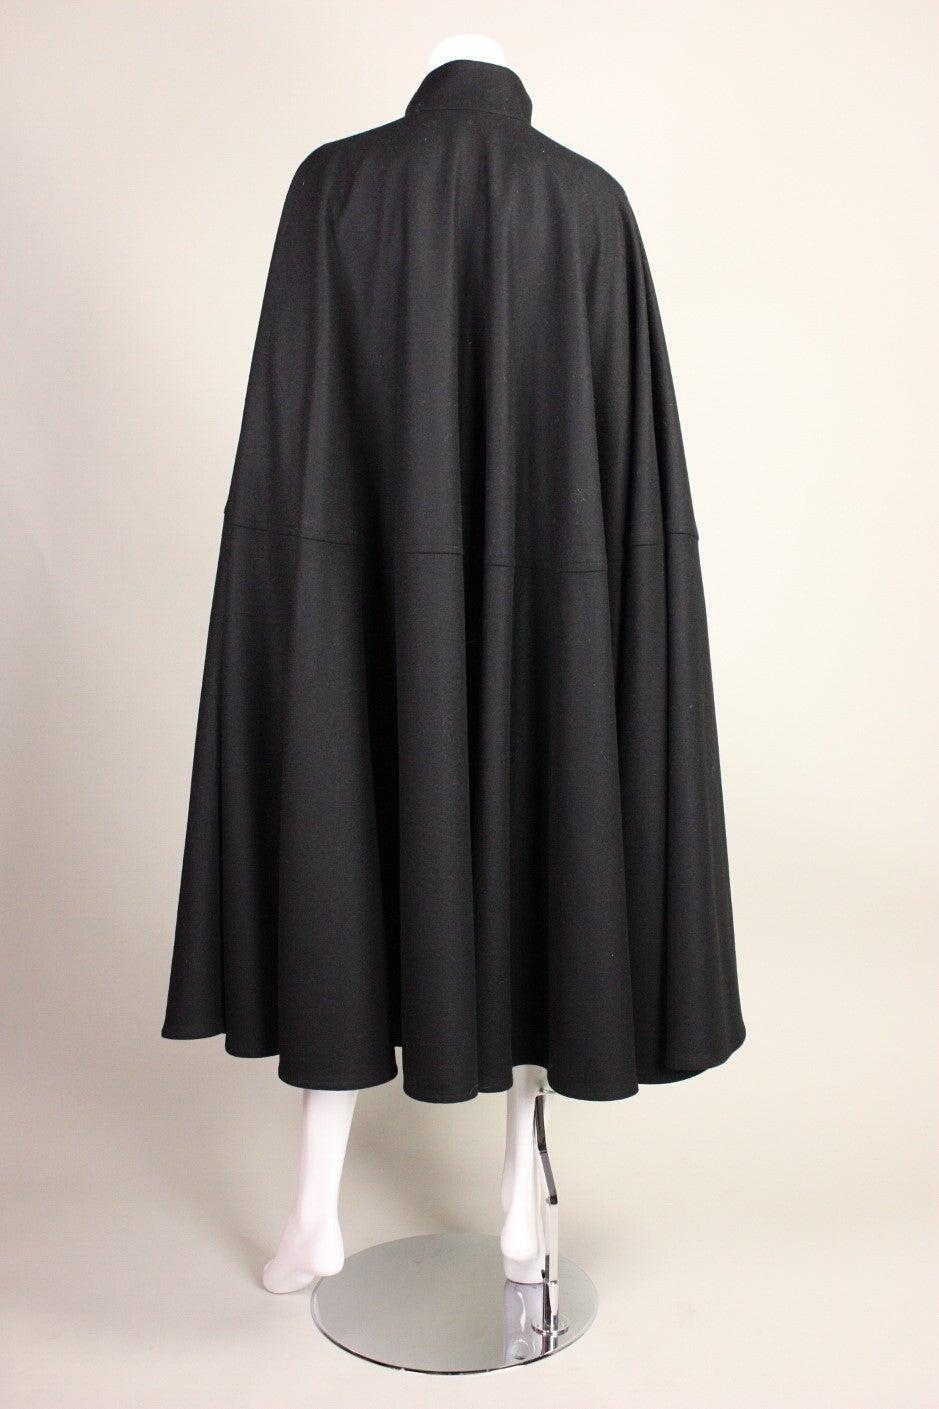 1970's Yves Saint Laurent Black Wool Cape 4